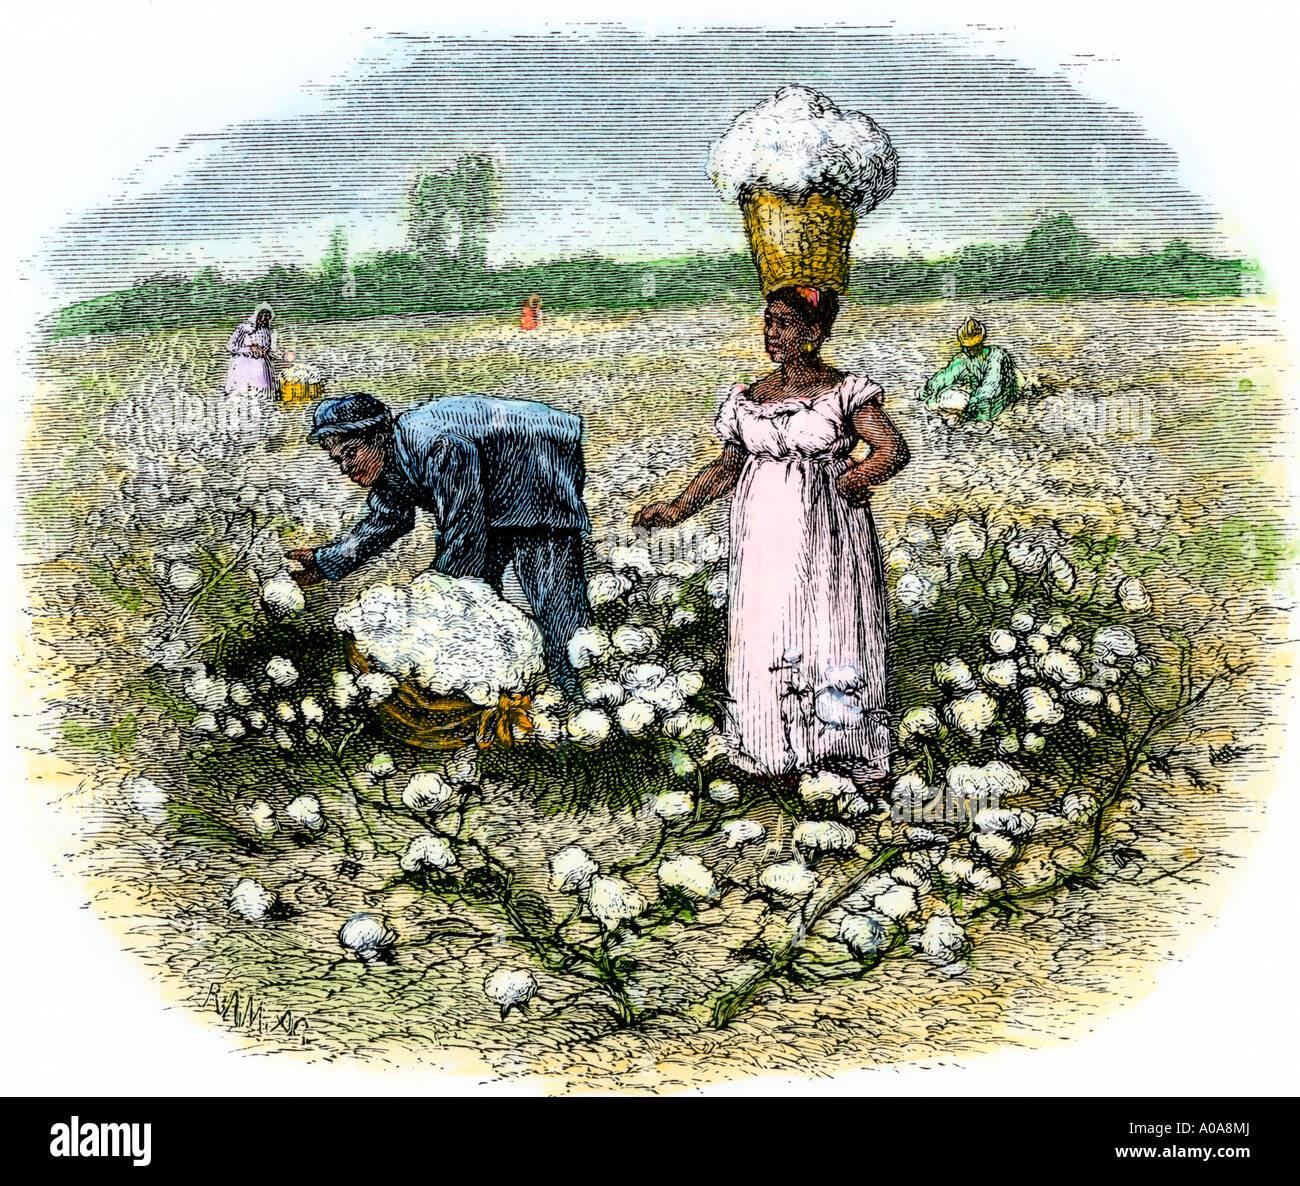 Resultado de imagen para picking cotton 1860